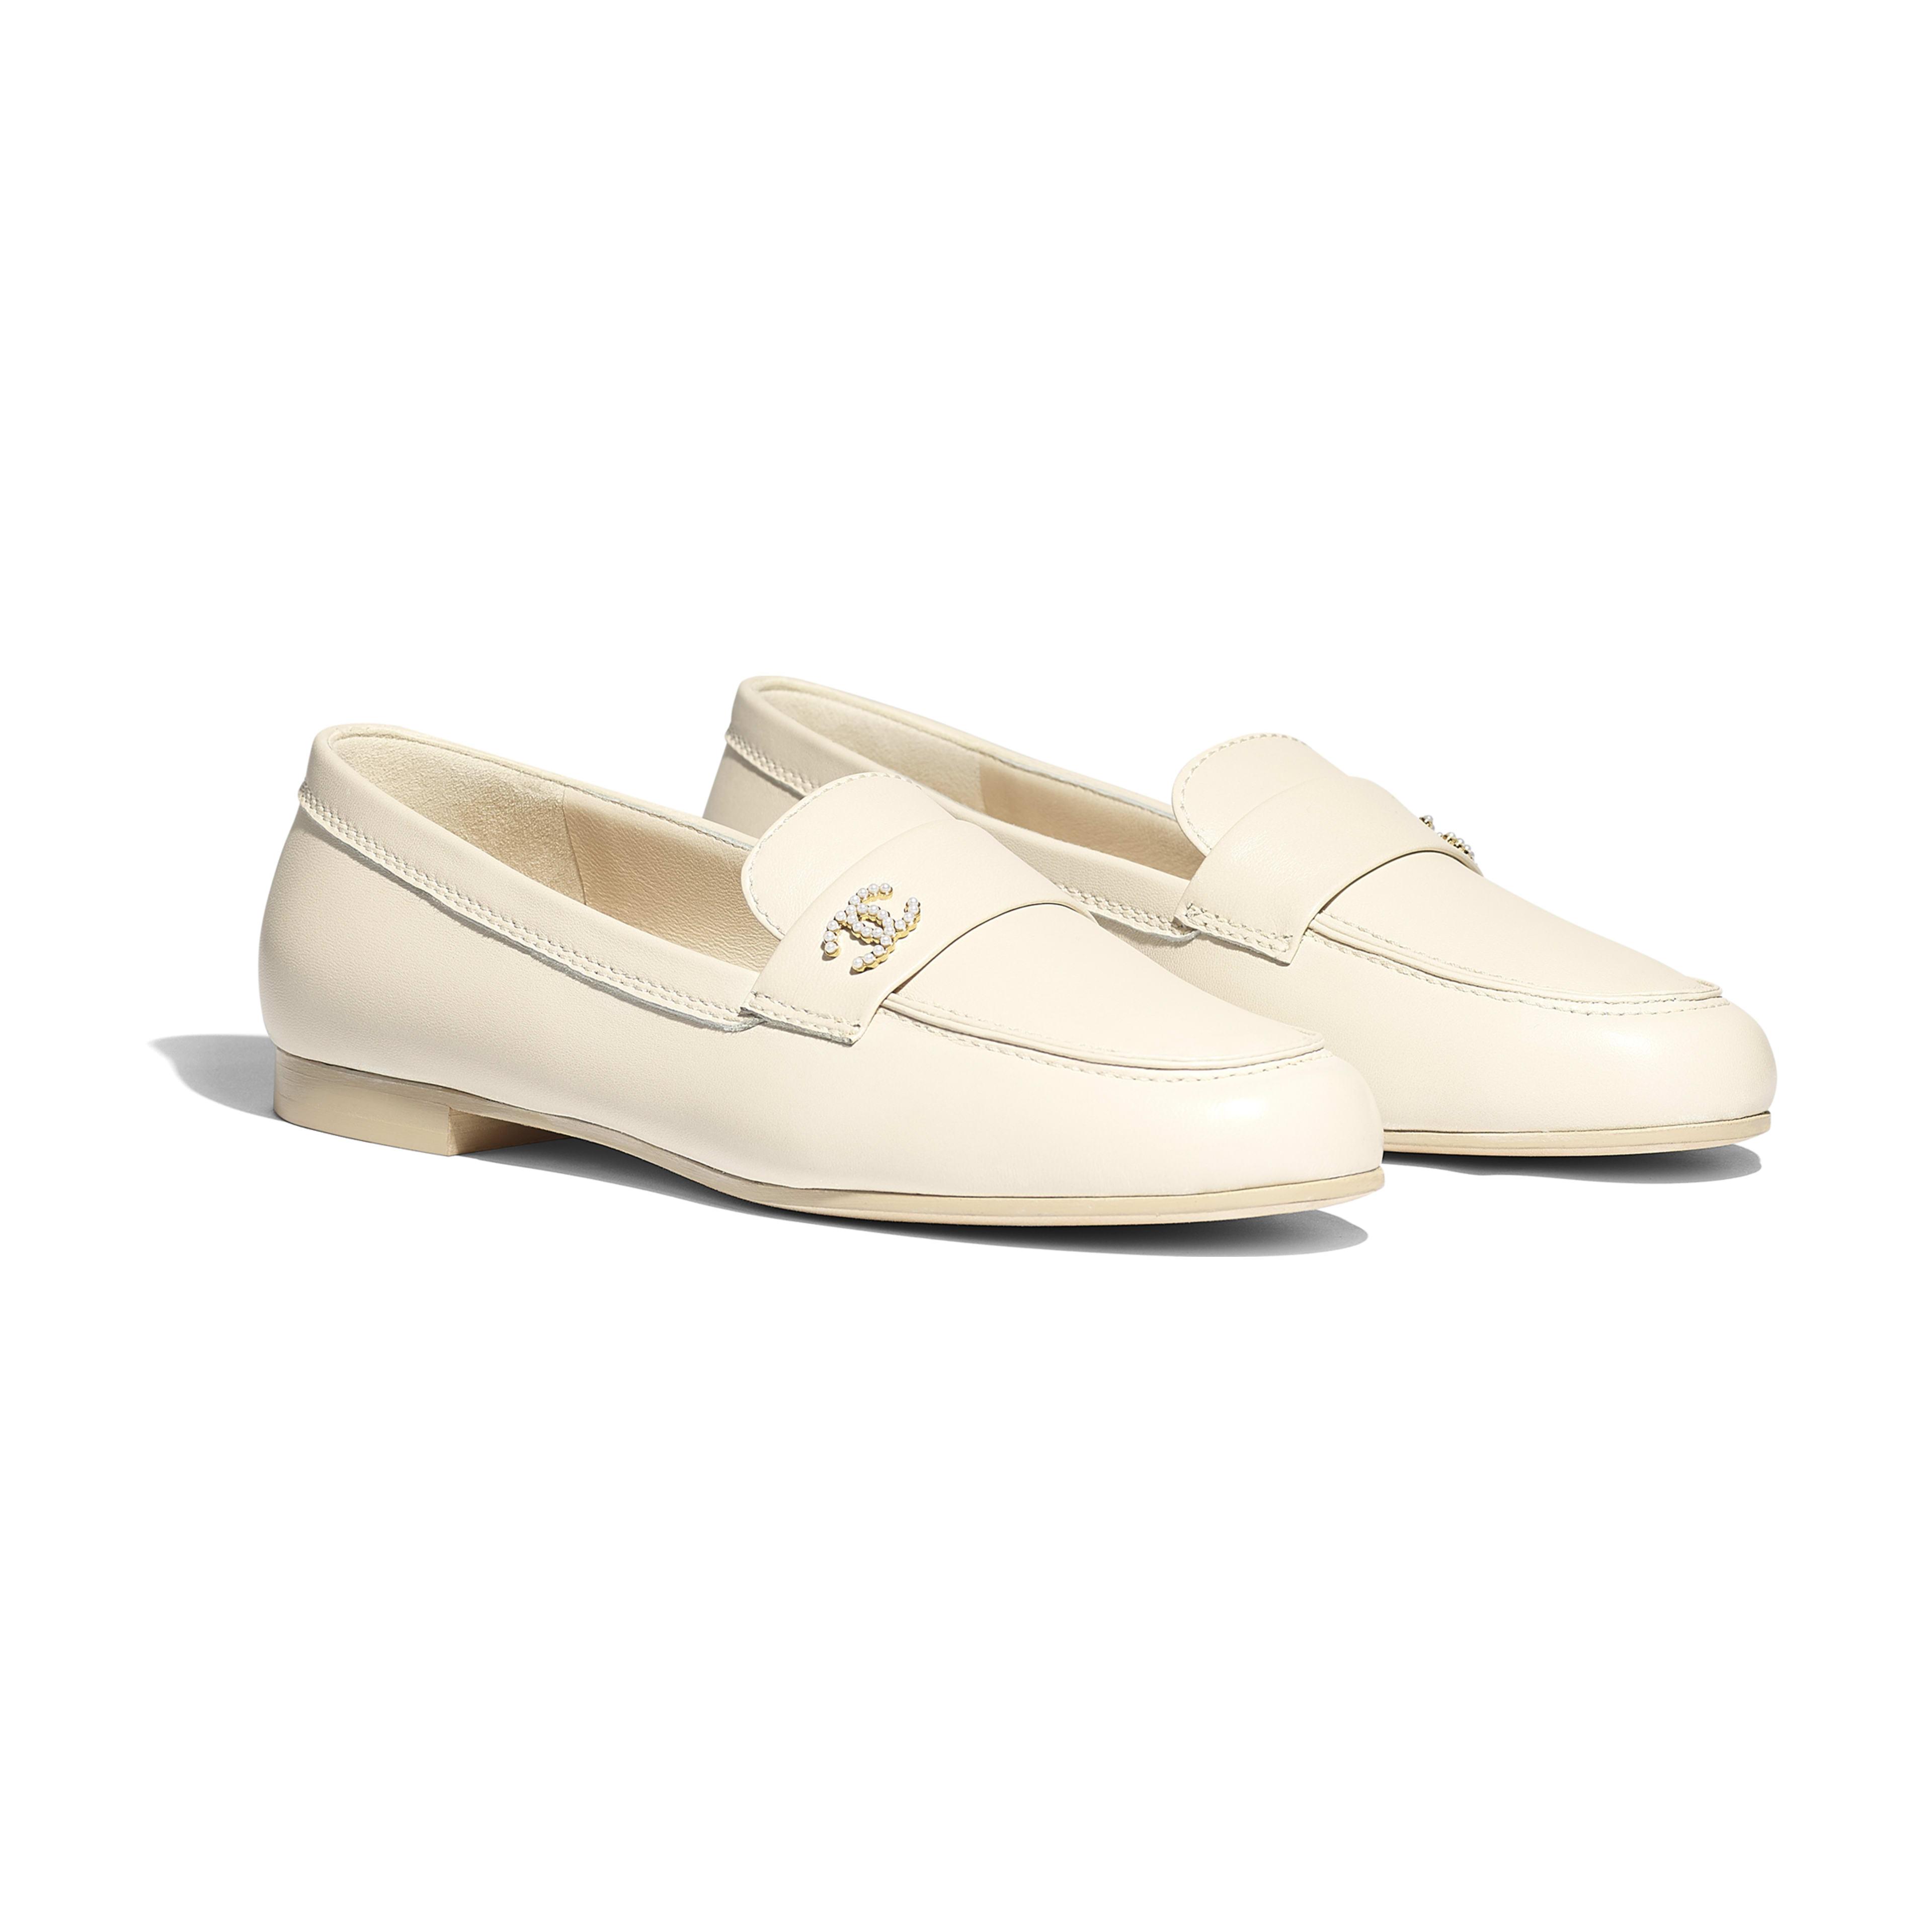 Loafers - Light Beige - Lambskin - Alternative view - see full sized version